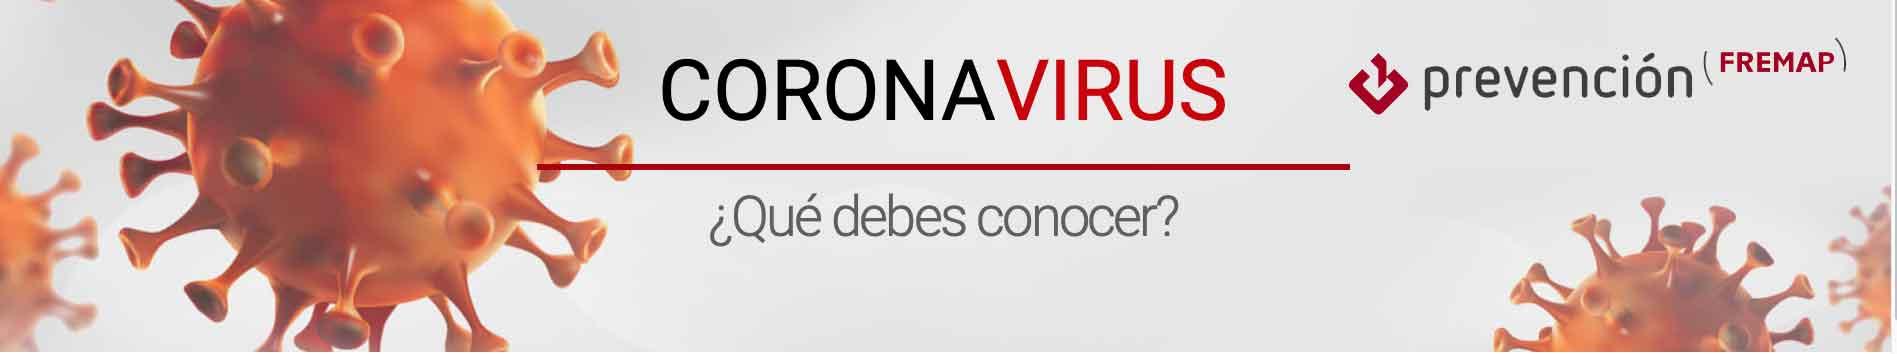 Coronavirus Agremia